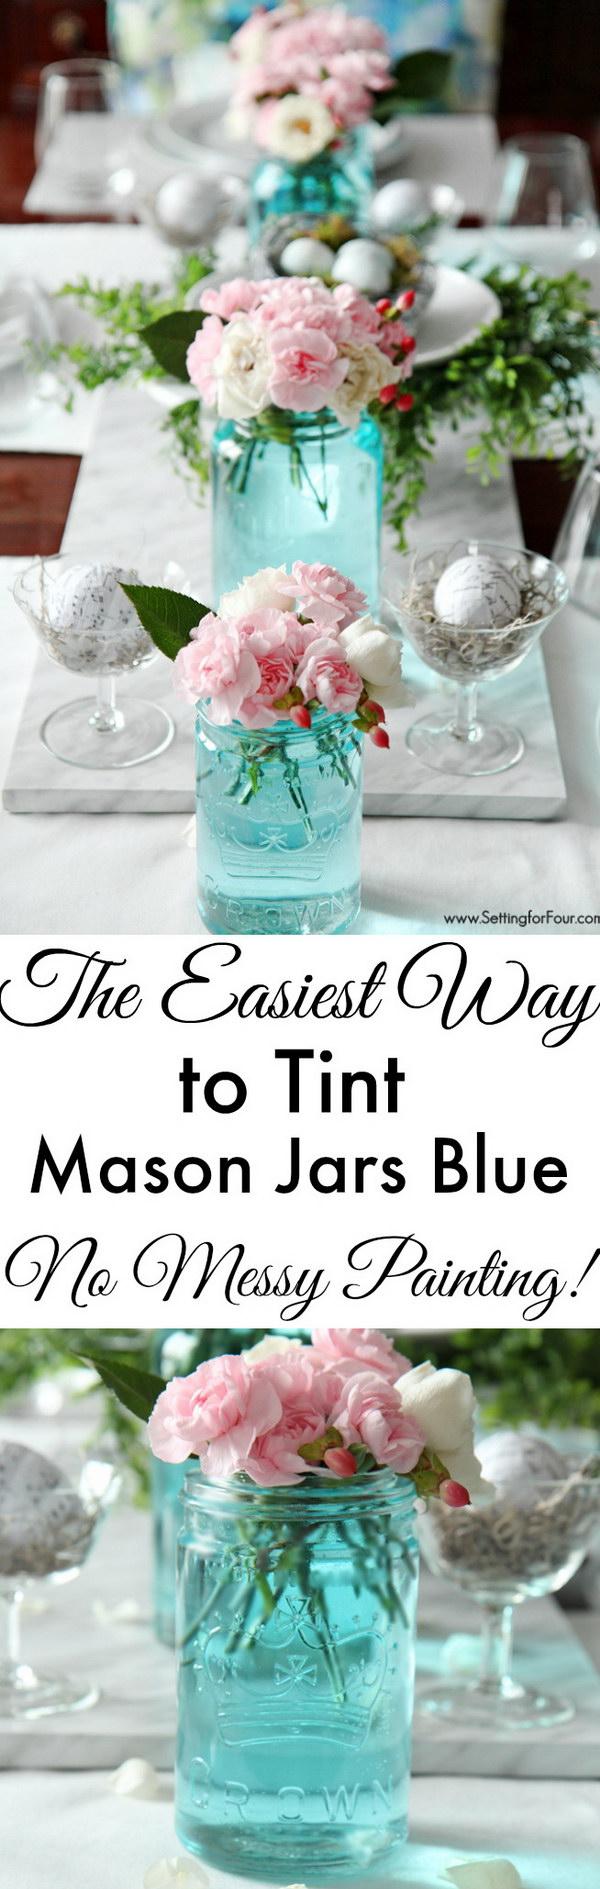 Beautiful Tint Mason Jars Blue